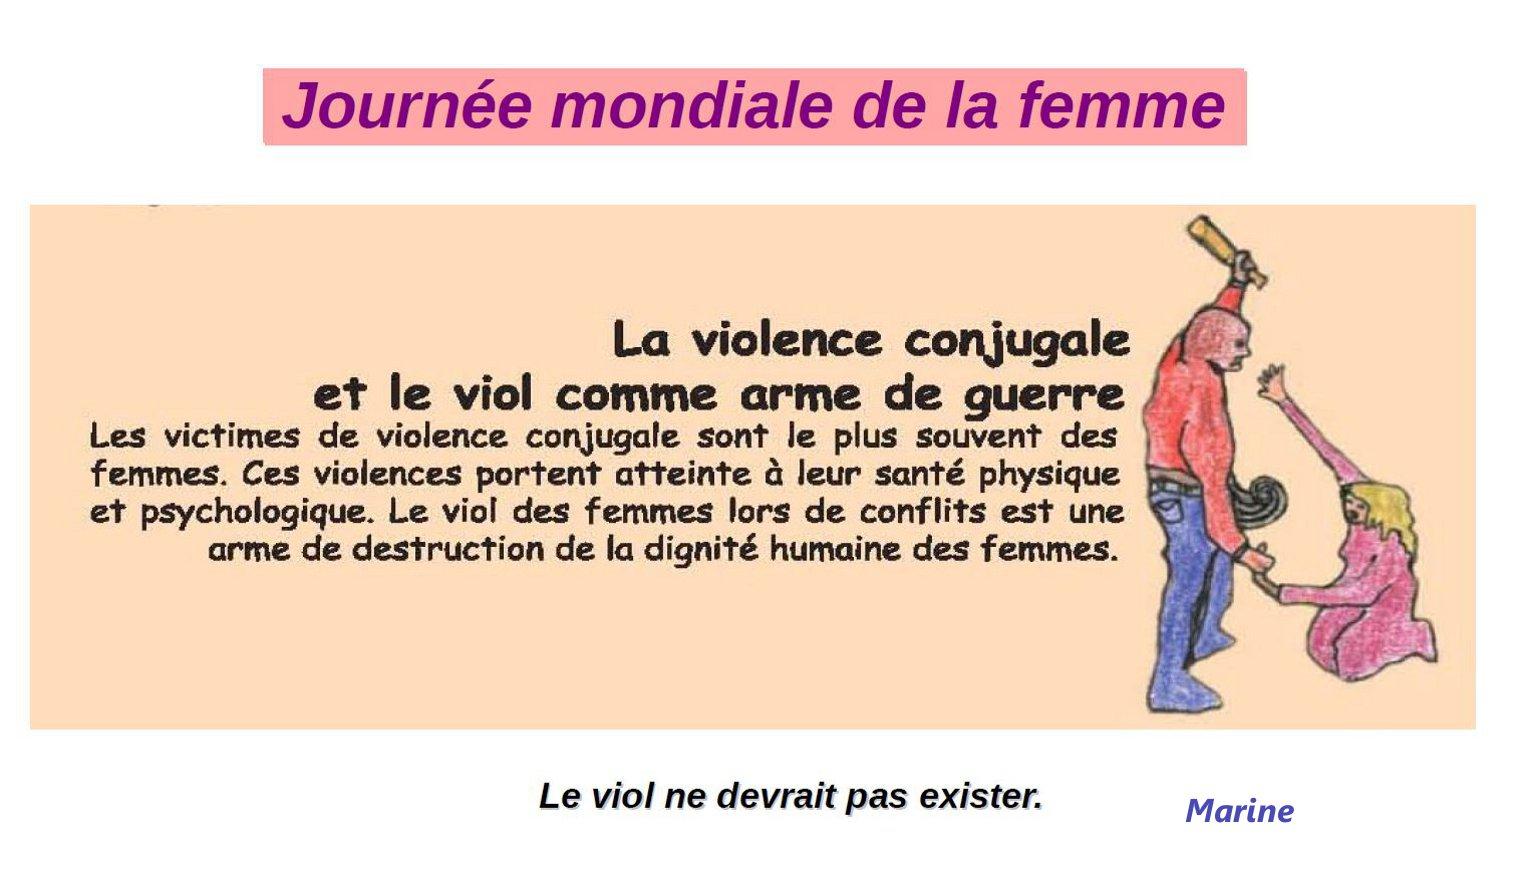 20210308-journee-droits-femme-marine1